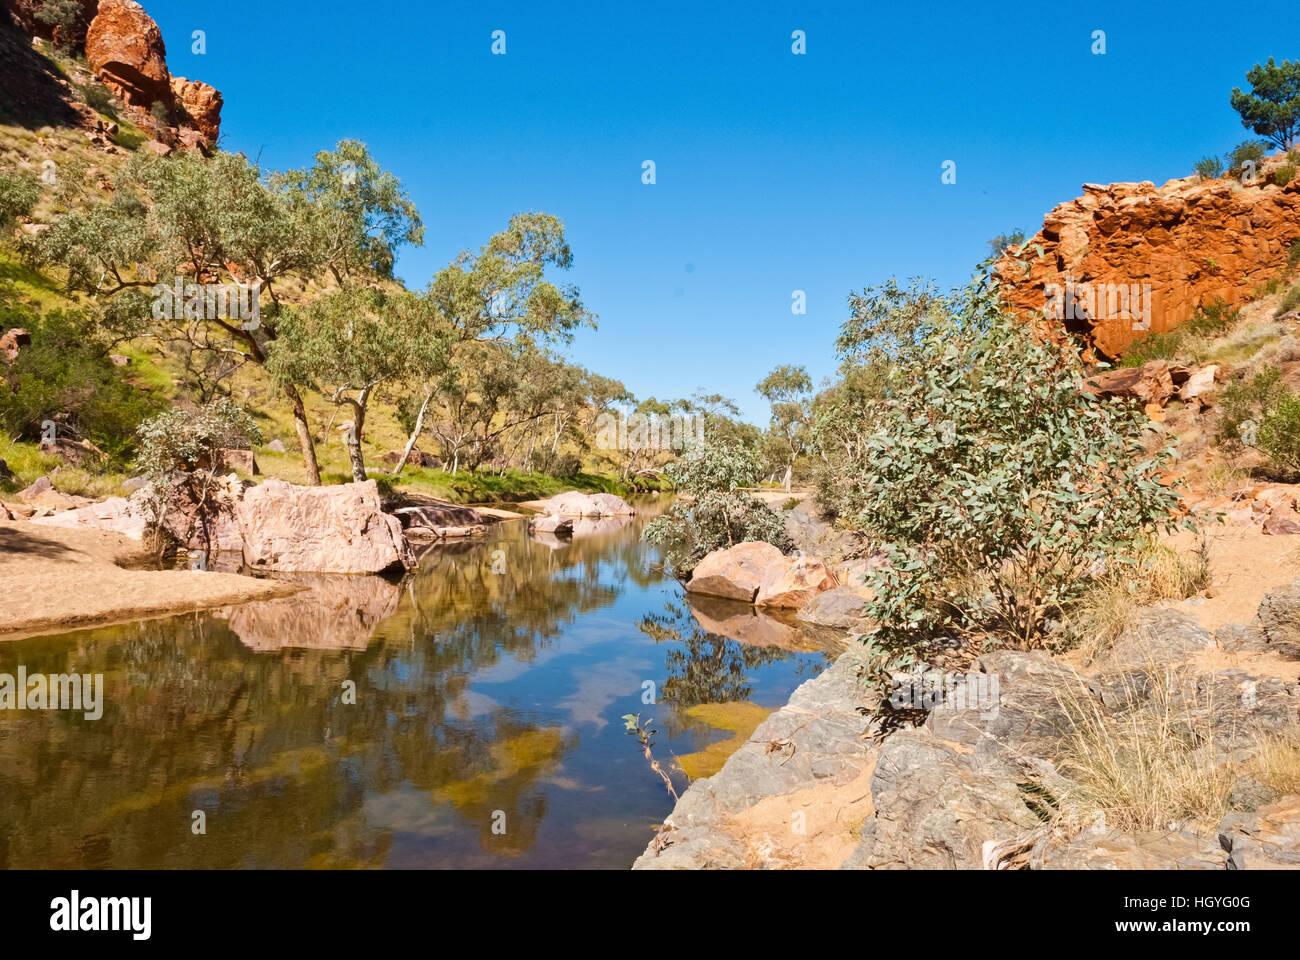 Simpsons Gap, Northen Territory, Australia - Stock Image